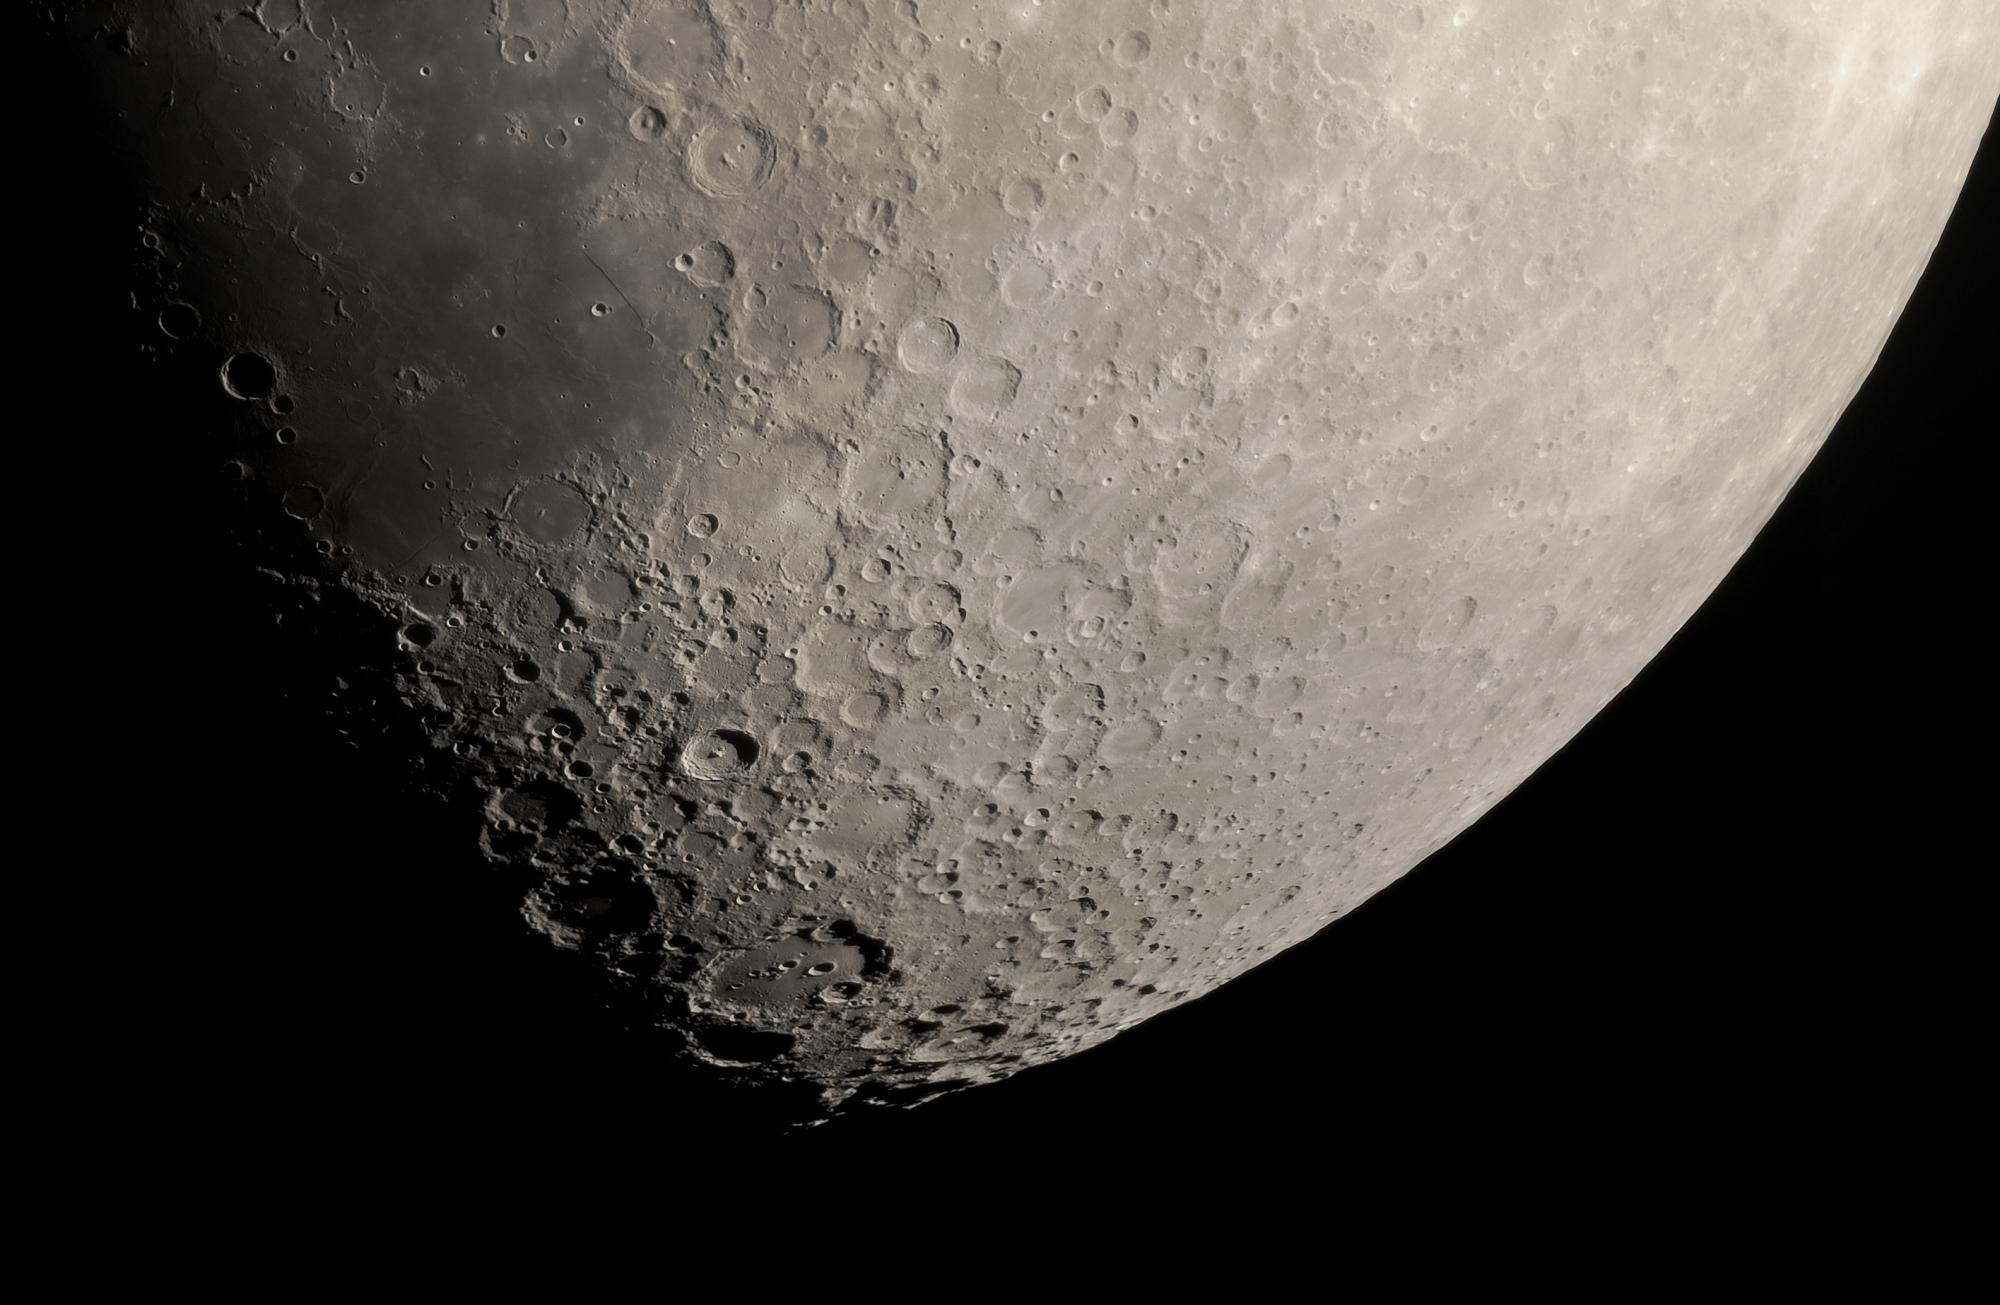 5ab9501110280_lune(70)b.thumb.jpg.5135fb65f9a8128cf424f7bf7f732a98.jpg